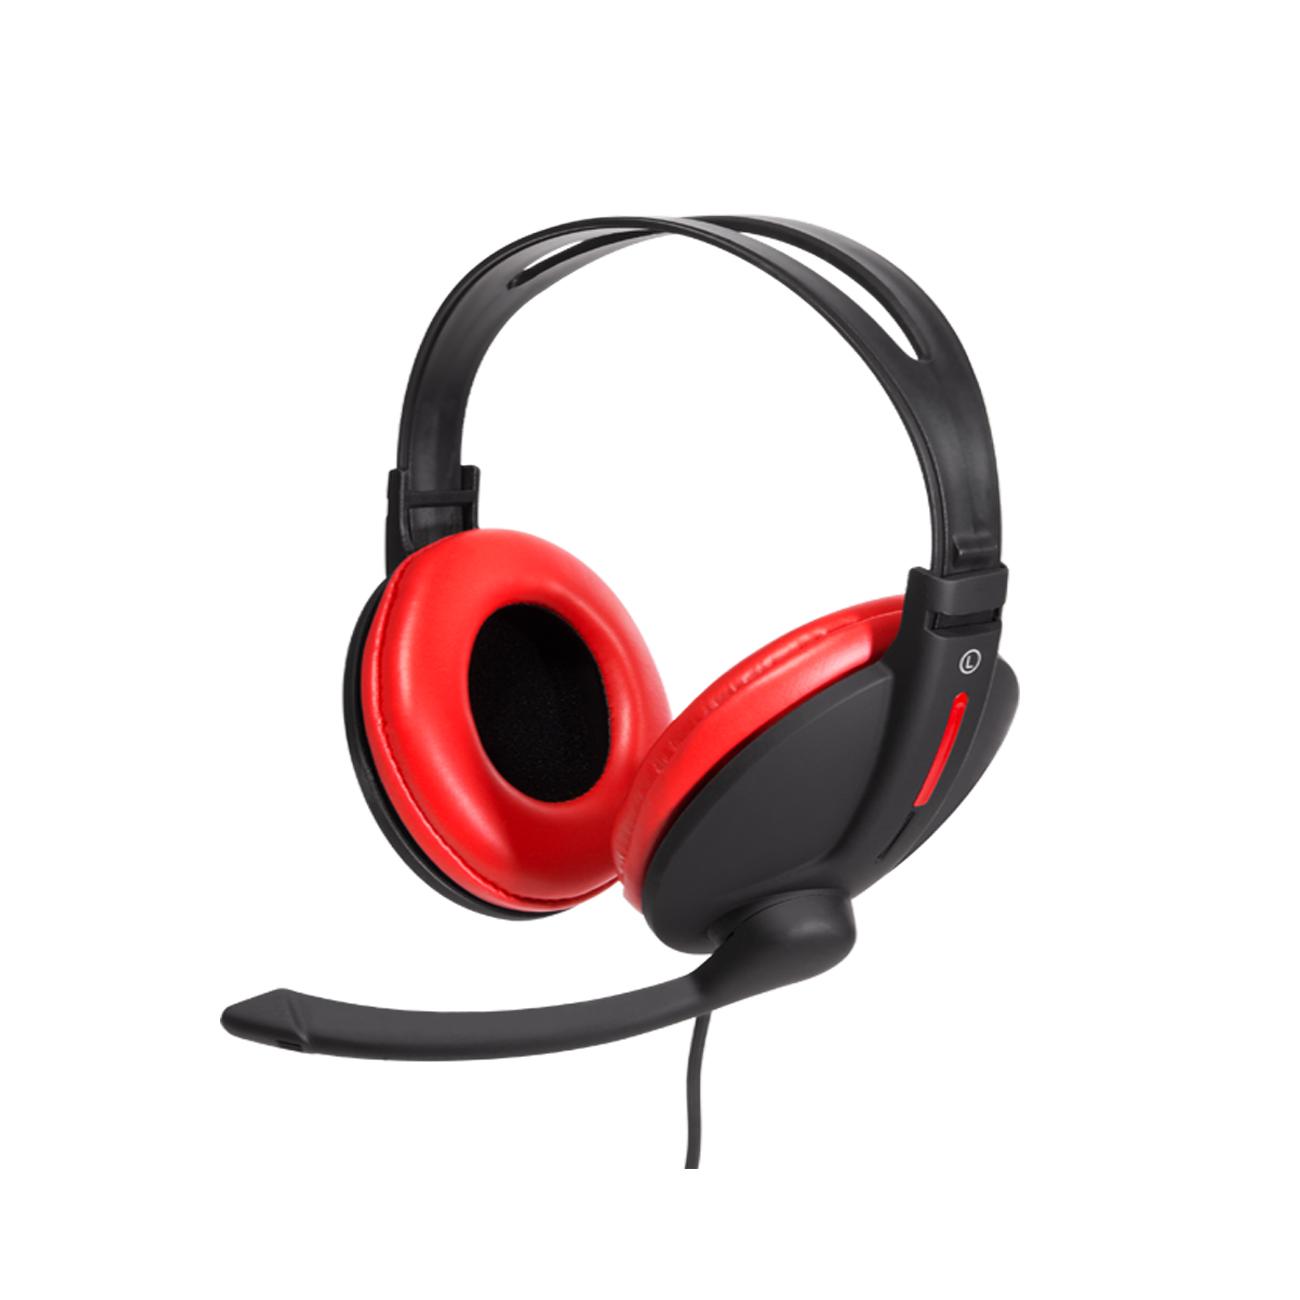 Mouse e Teclado Sem Fio Teclas Redondas c/ Webcam e Headset